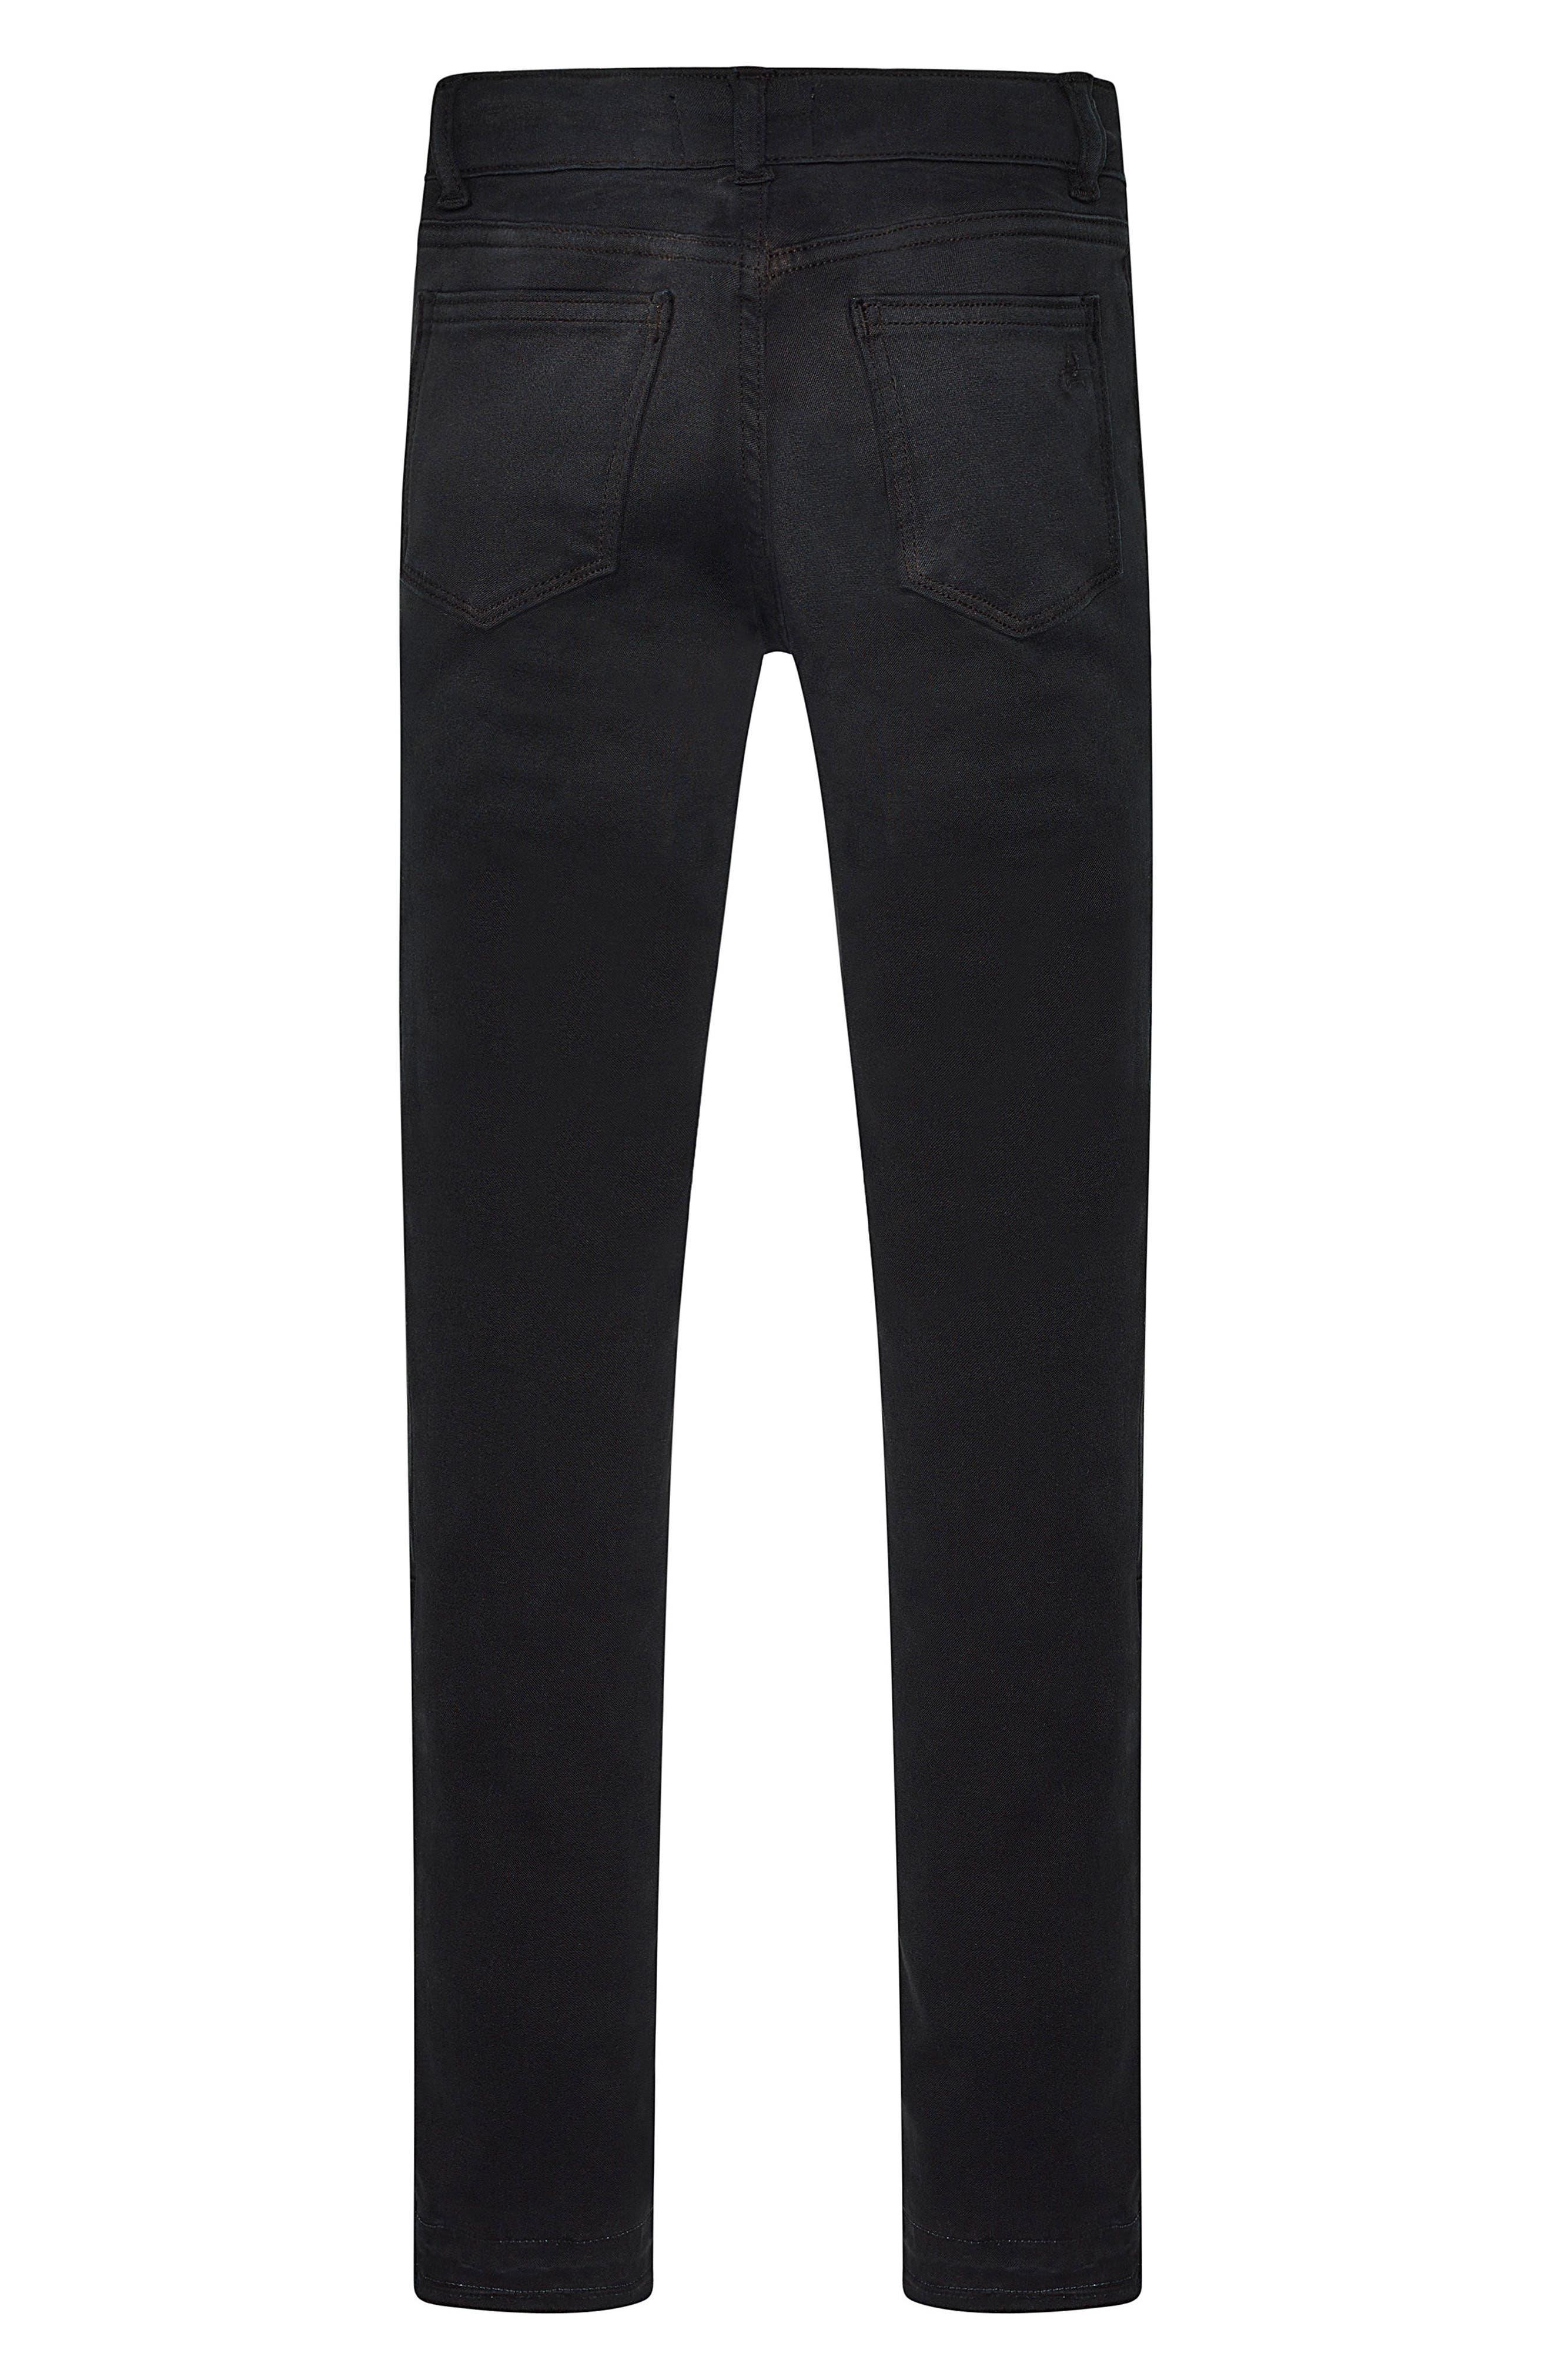 Moto Skinny Jeans,                             Main thumbnail 1, color,                             001